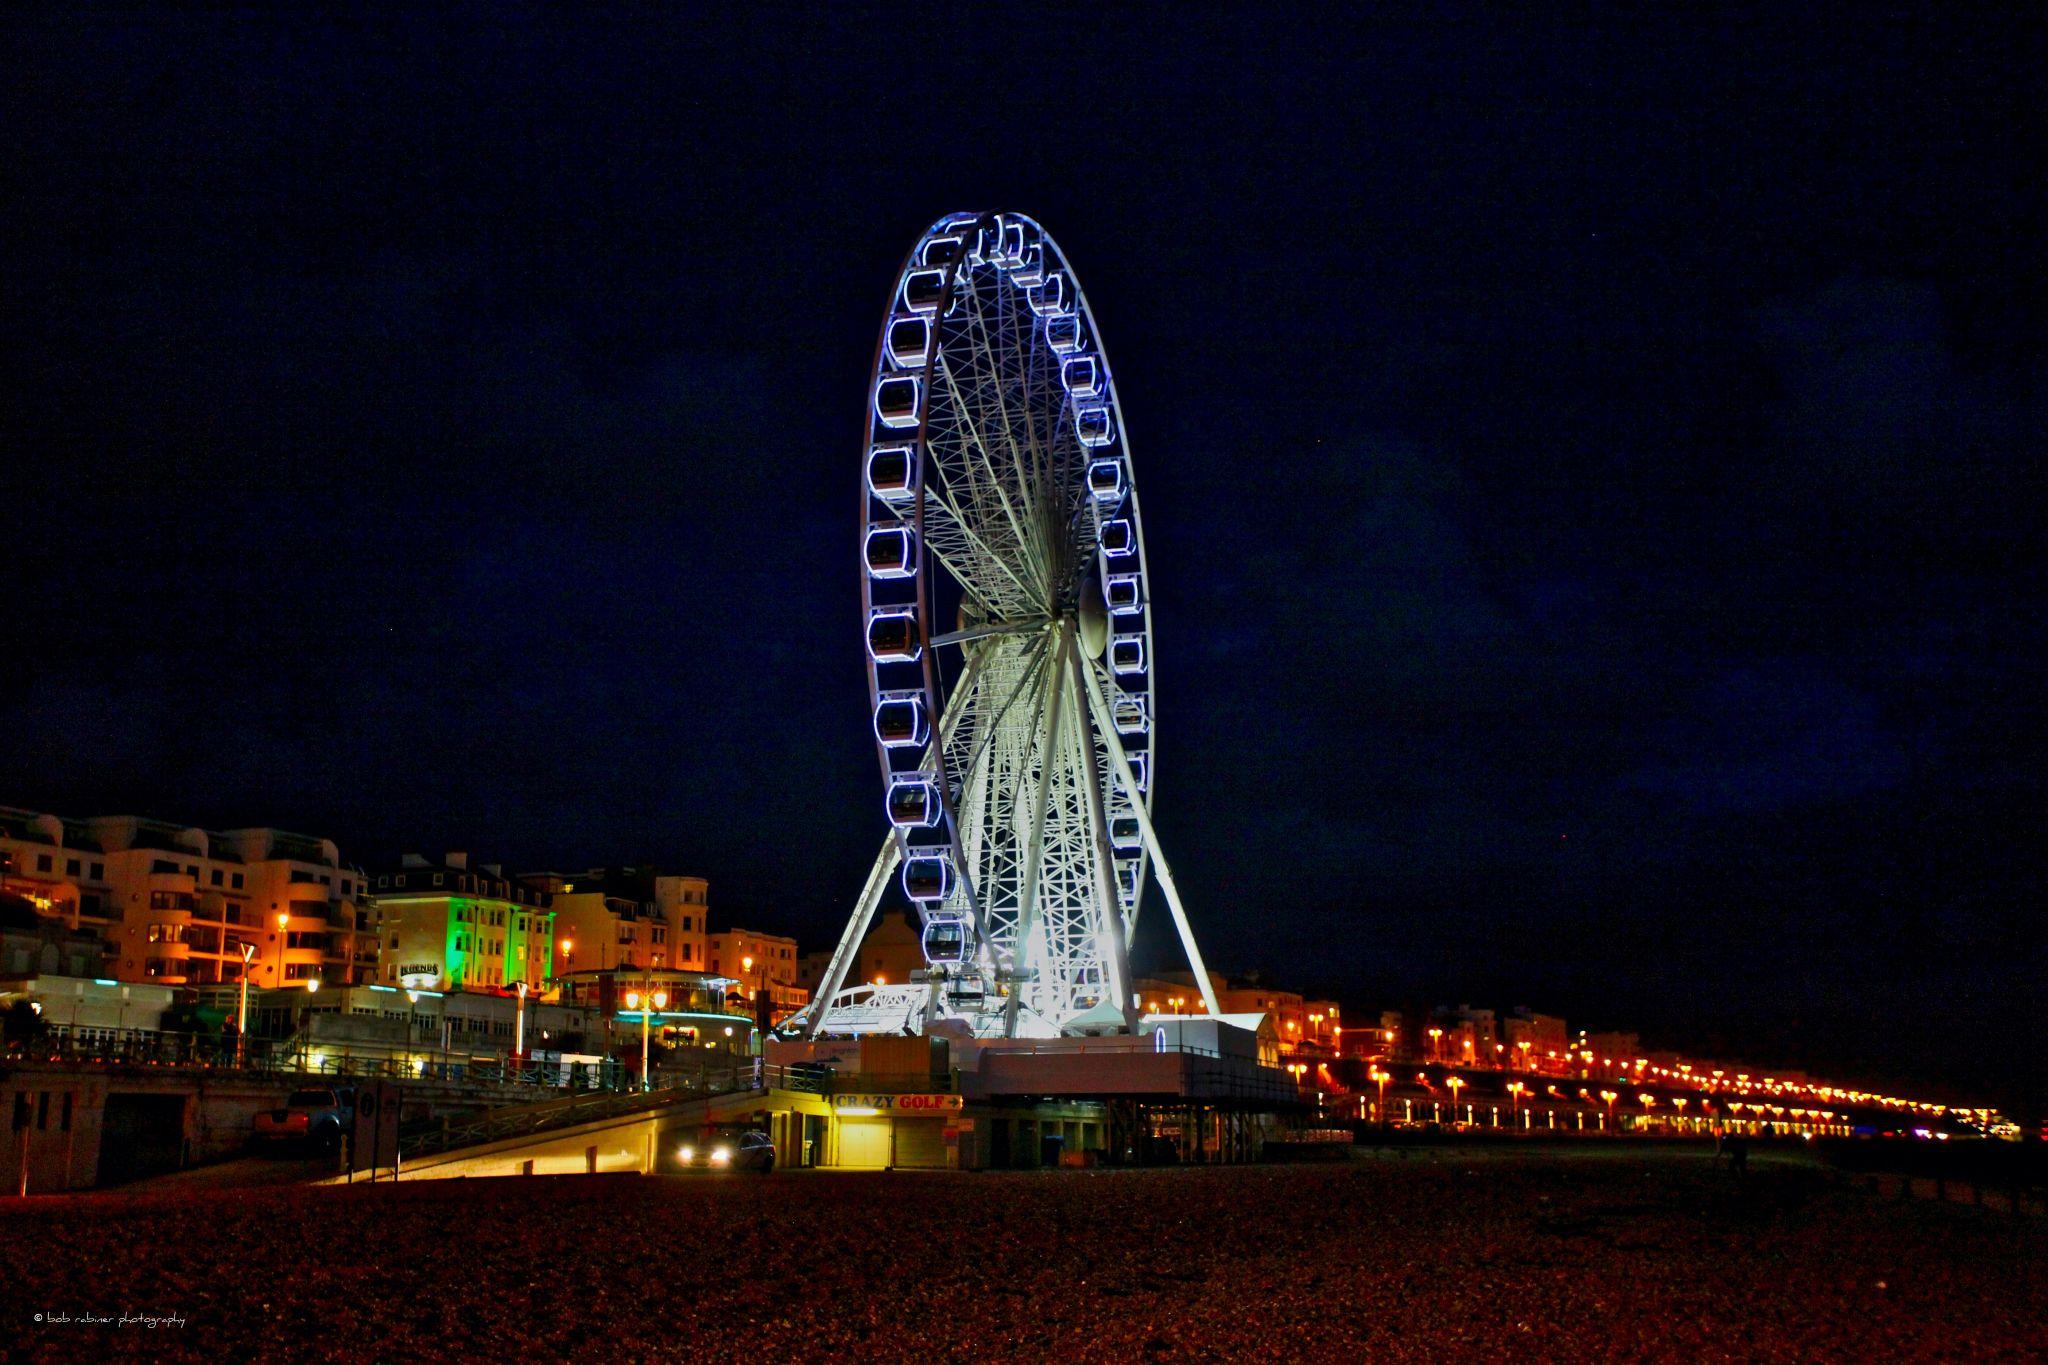 Brighton Pier Ferris Wheel, United Kingdom